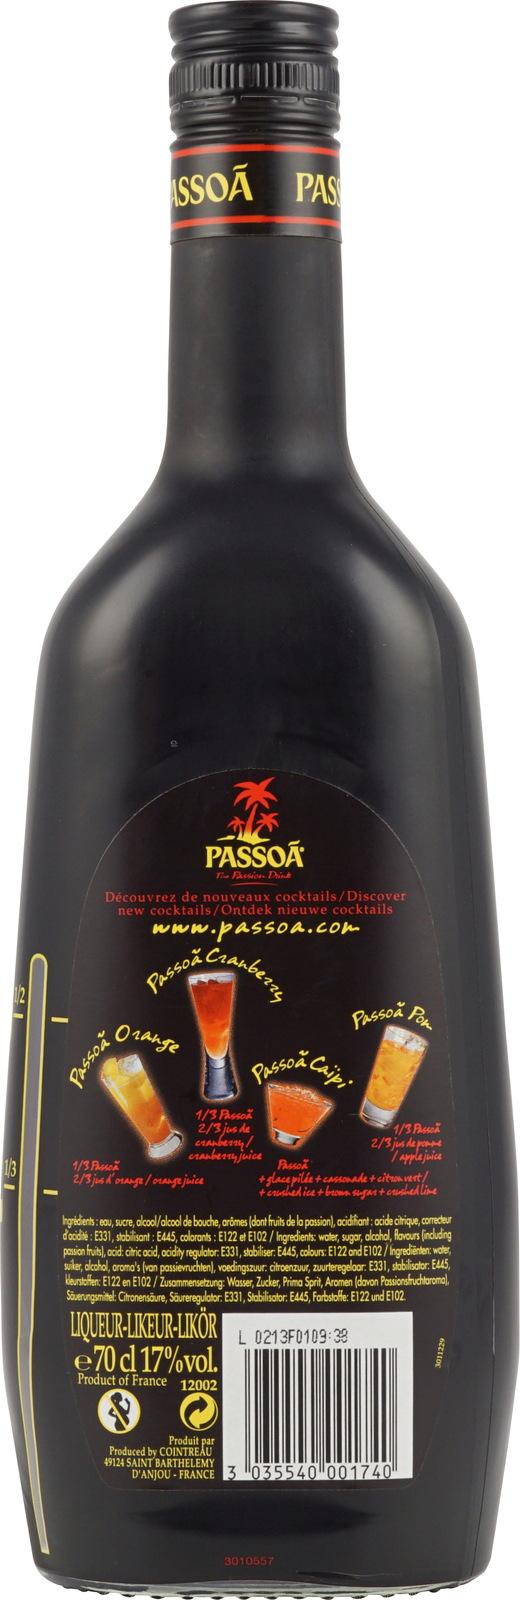 passoa lik r als passionsfruchtlik r zum sehr g nstigen. Black Bedroom Furniture Sets. Home Design Ideas